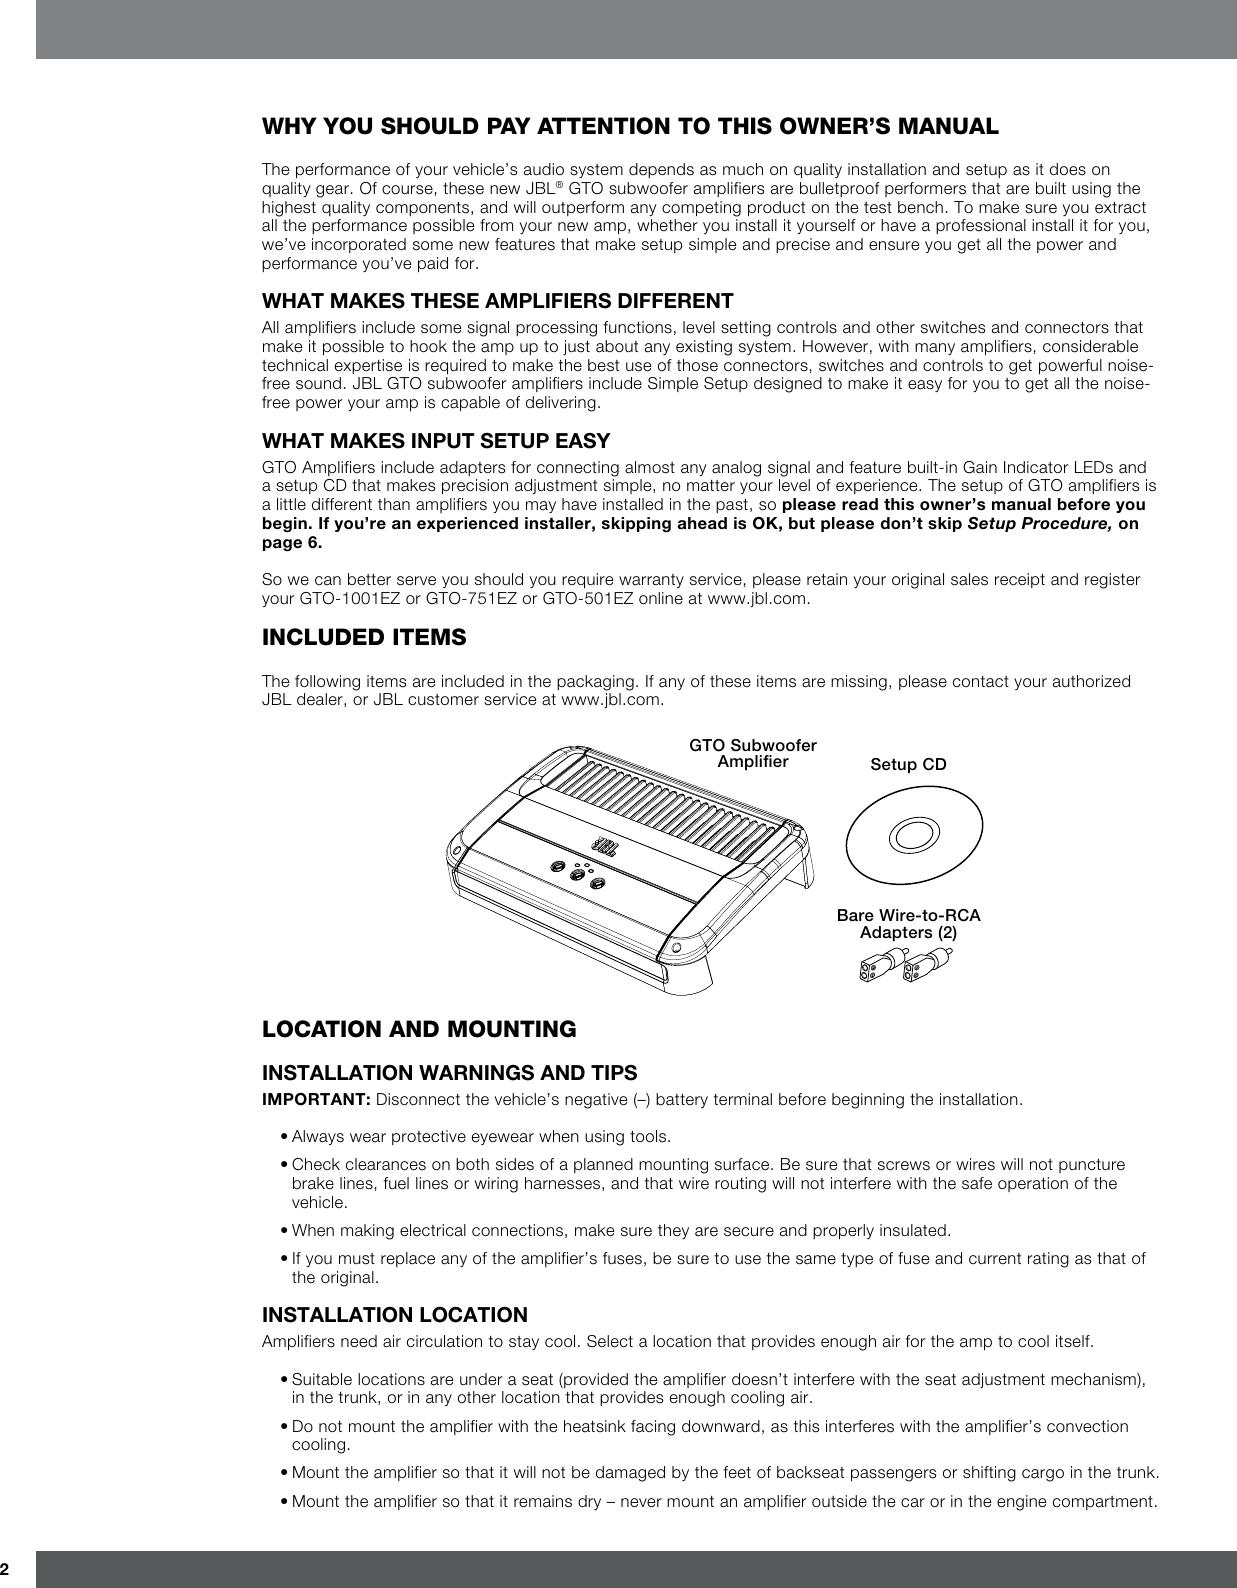 page 2 of 11 - jbl jbl-gto-1001ez-users-manual-